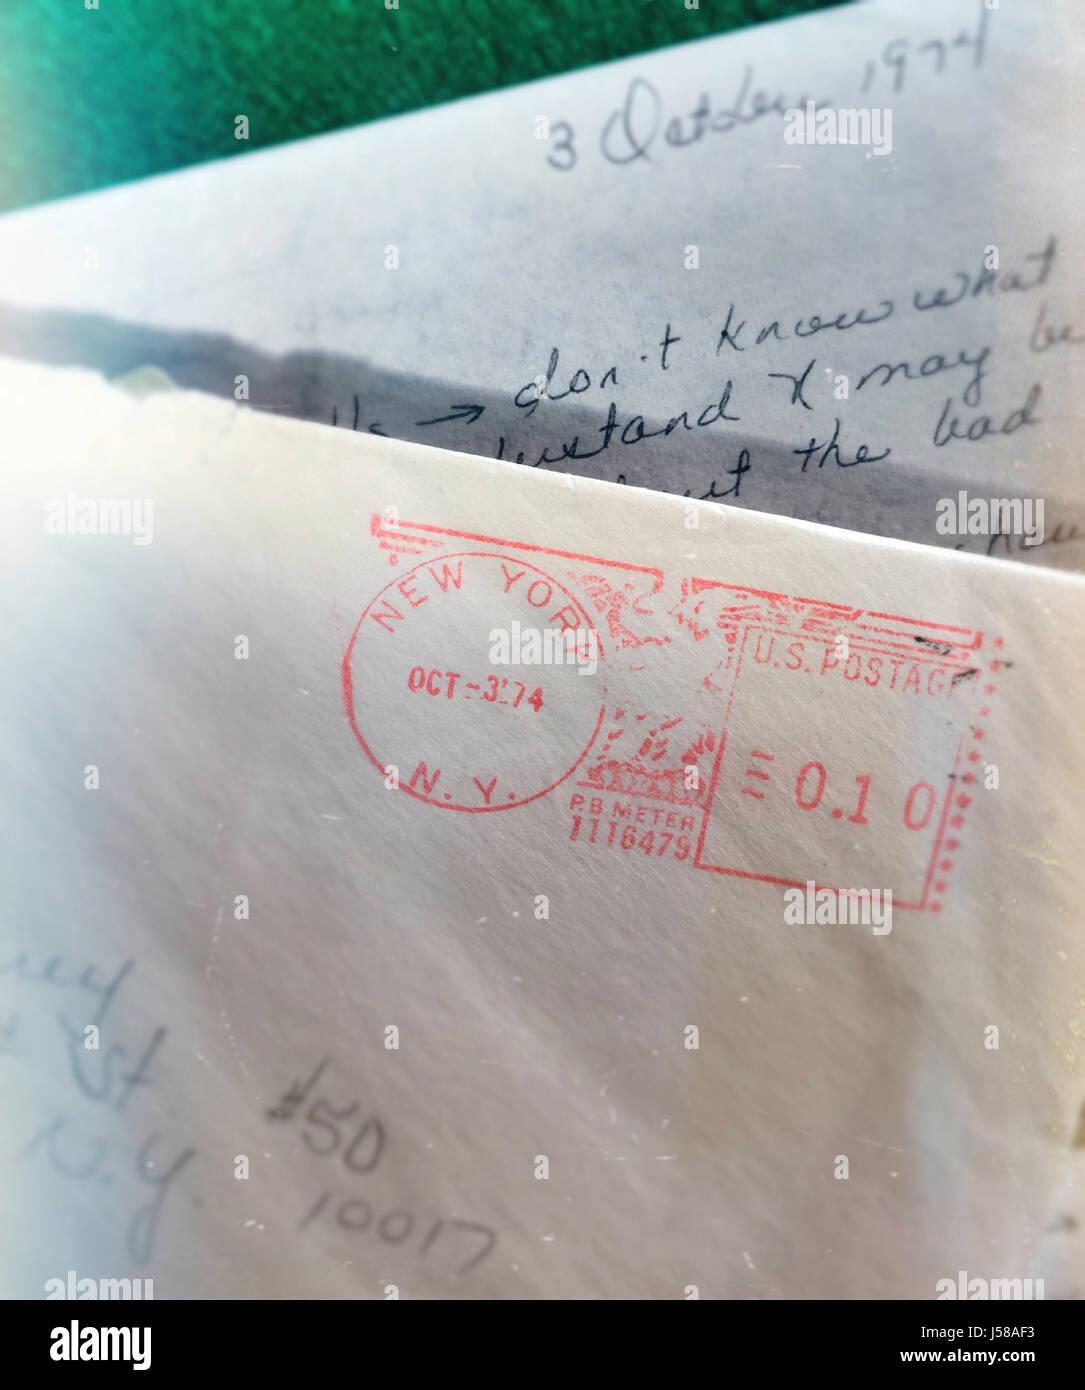 Vintage 1974 Letter with Postmark, USA - Stock Image